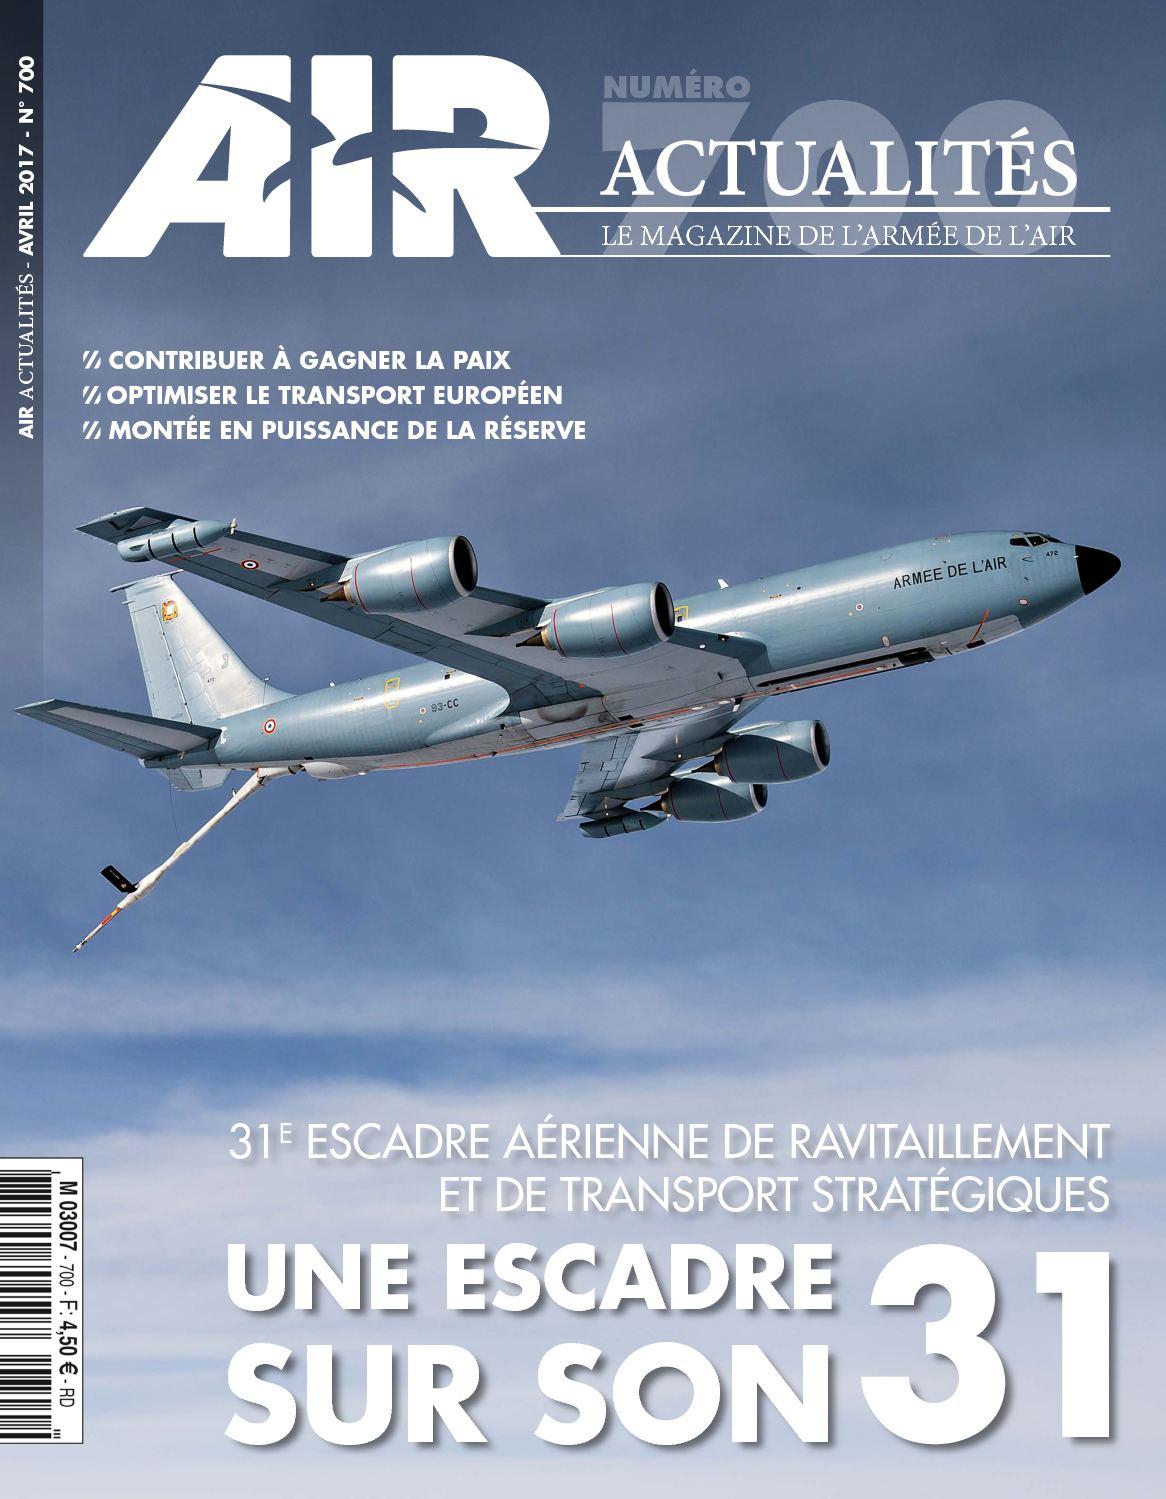 AIR ACTUALITÉS N°700 AVRIL 2017